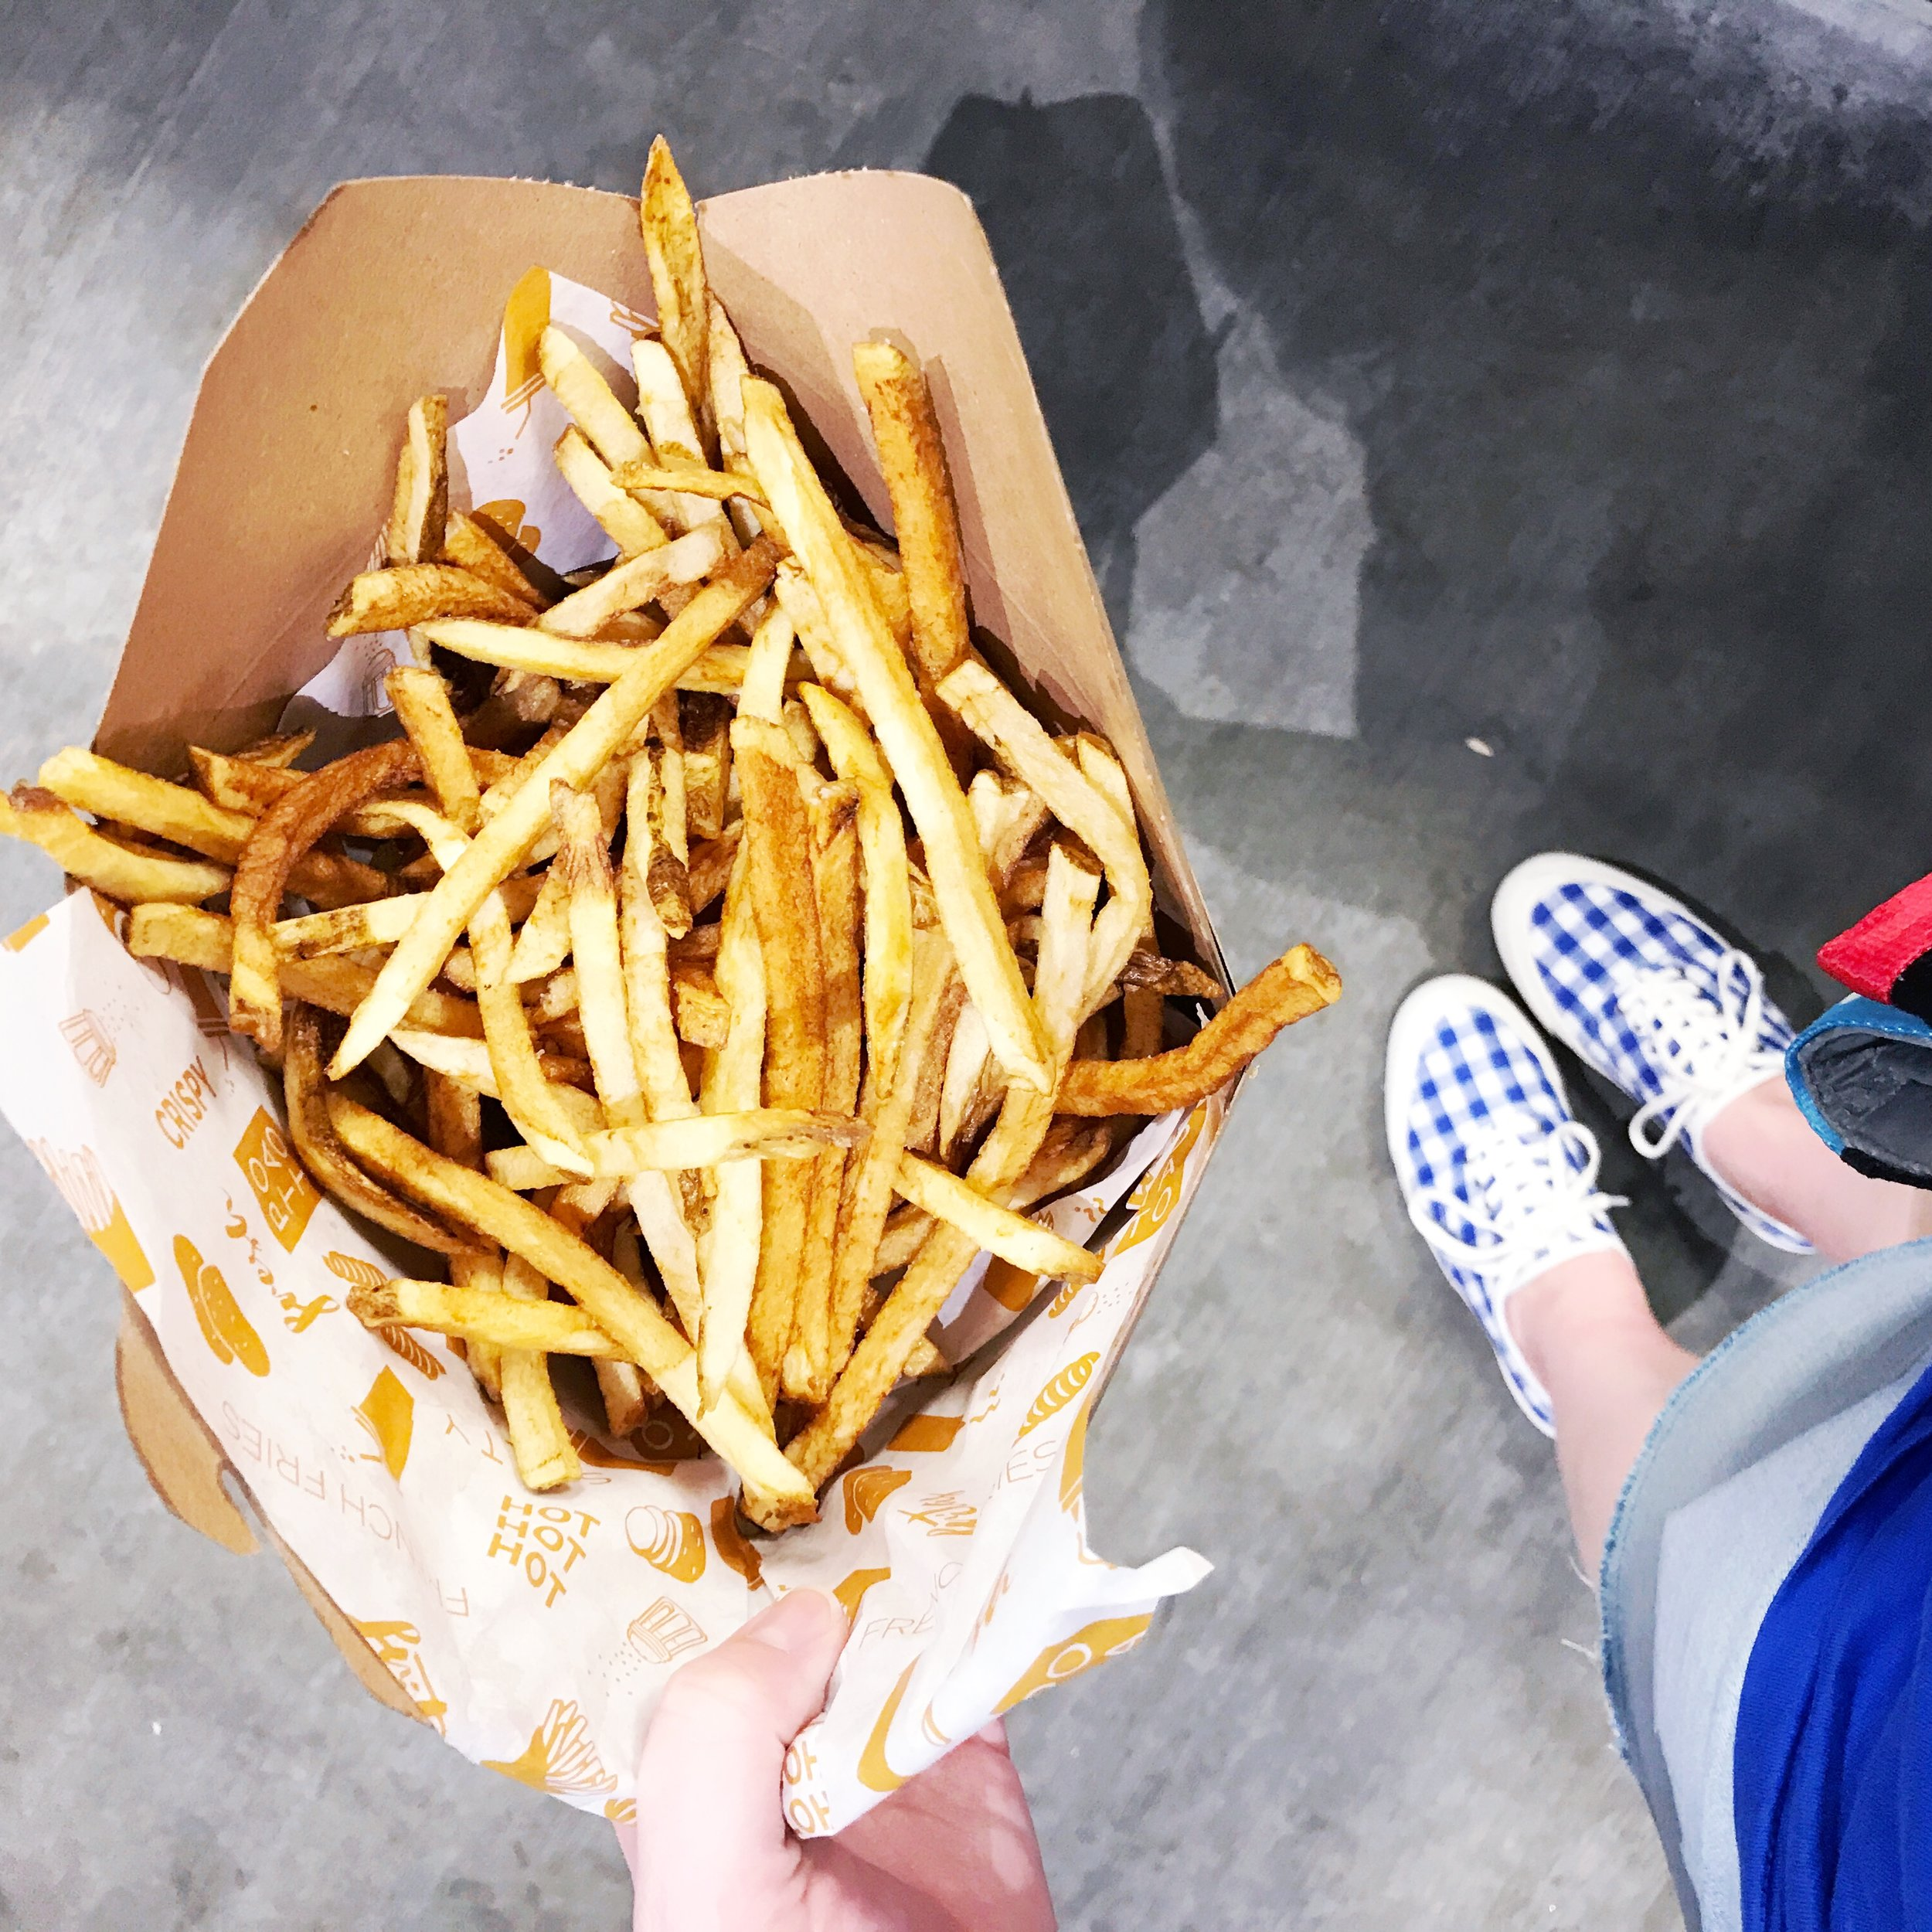 Gluten Free at Suntrust Park, Atlanta Braves